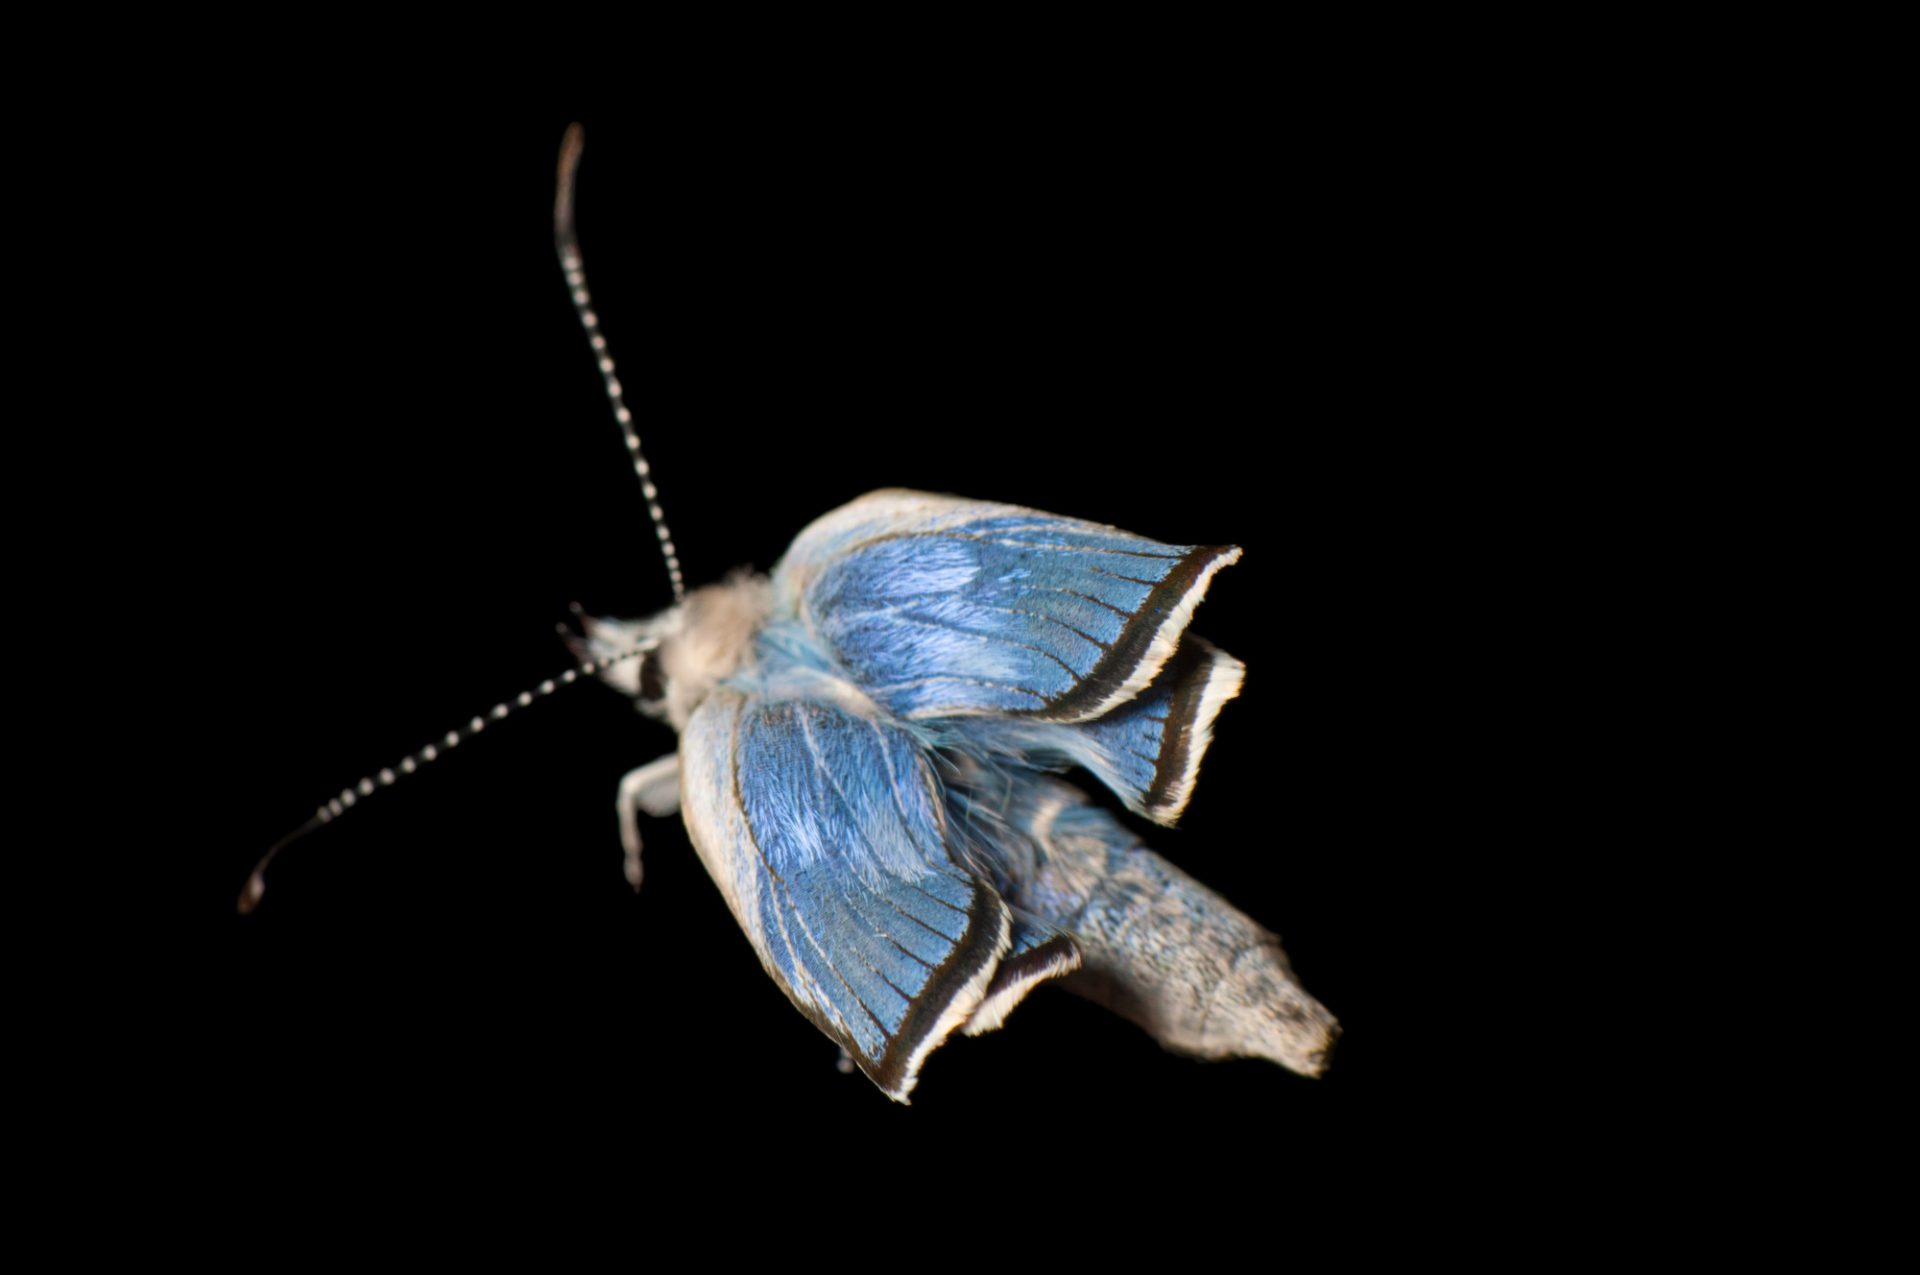 A federally endangered Karner blue butterfly, Lycaeides melissa samuelis.